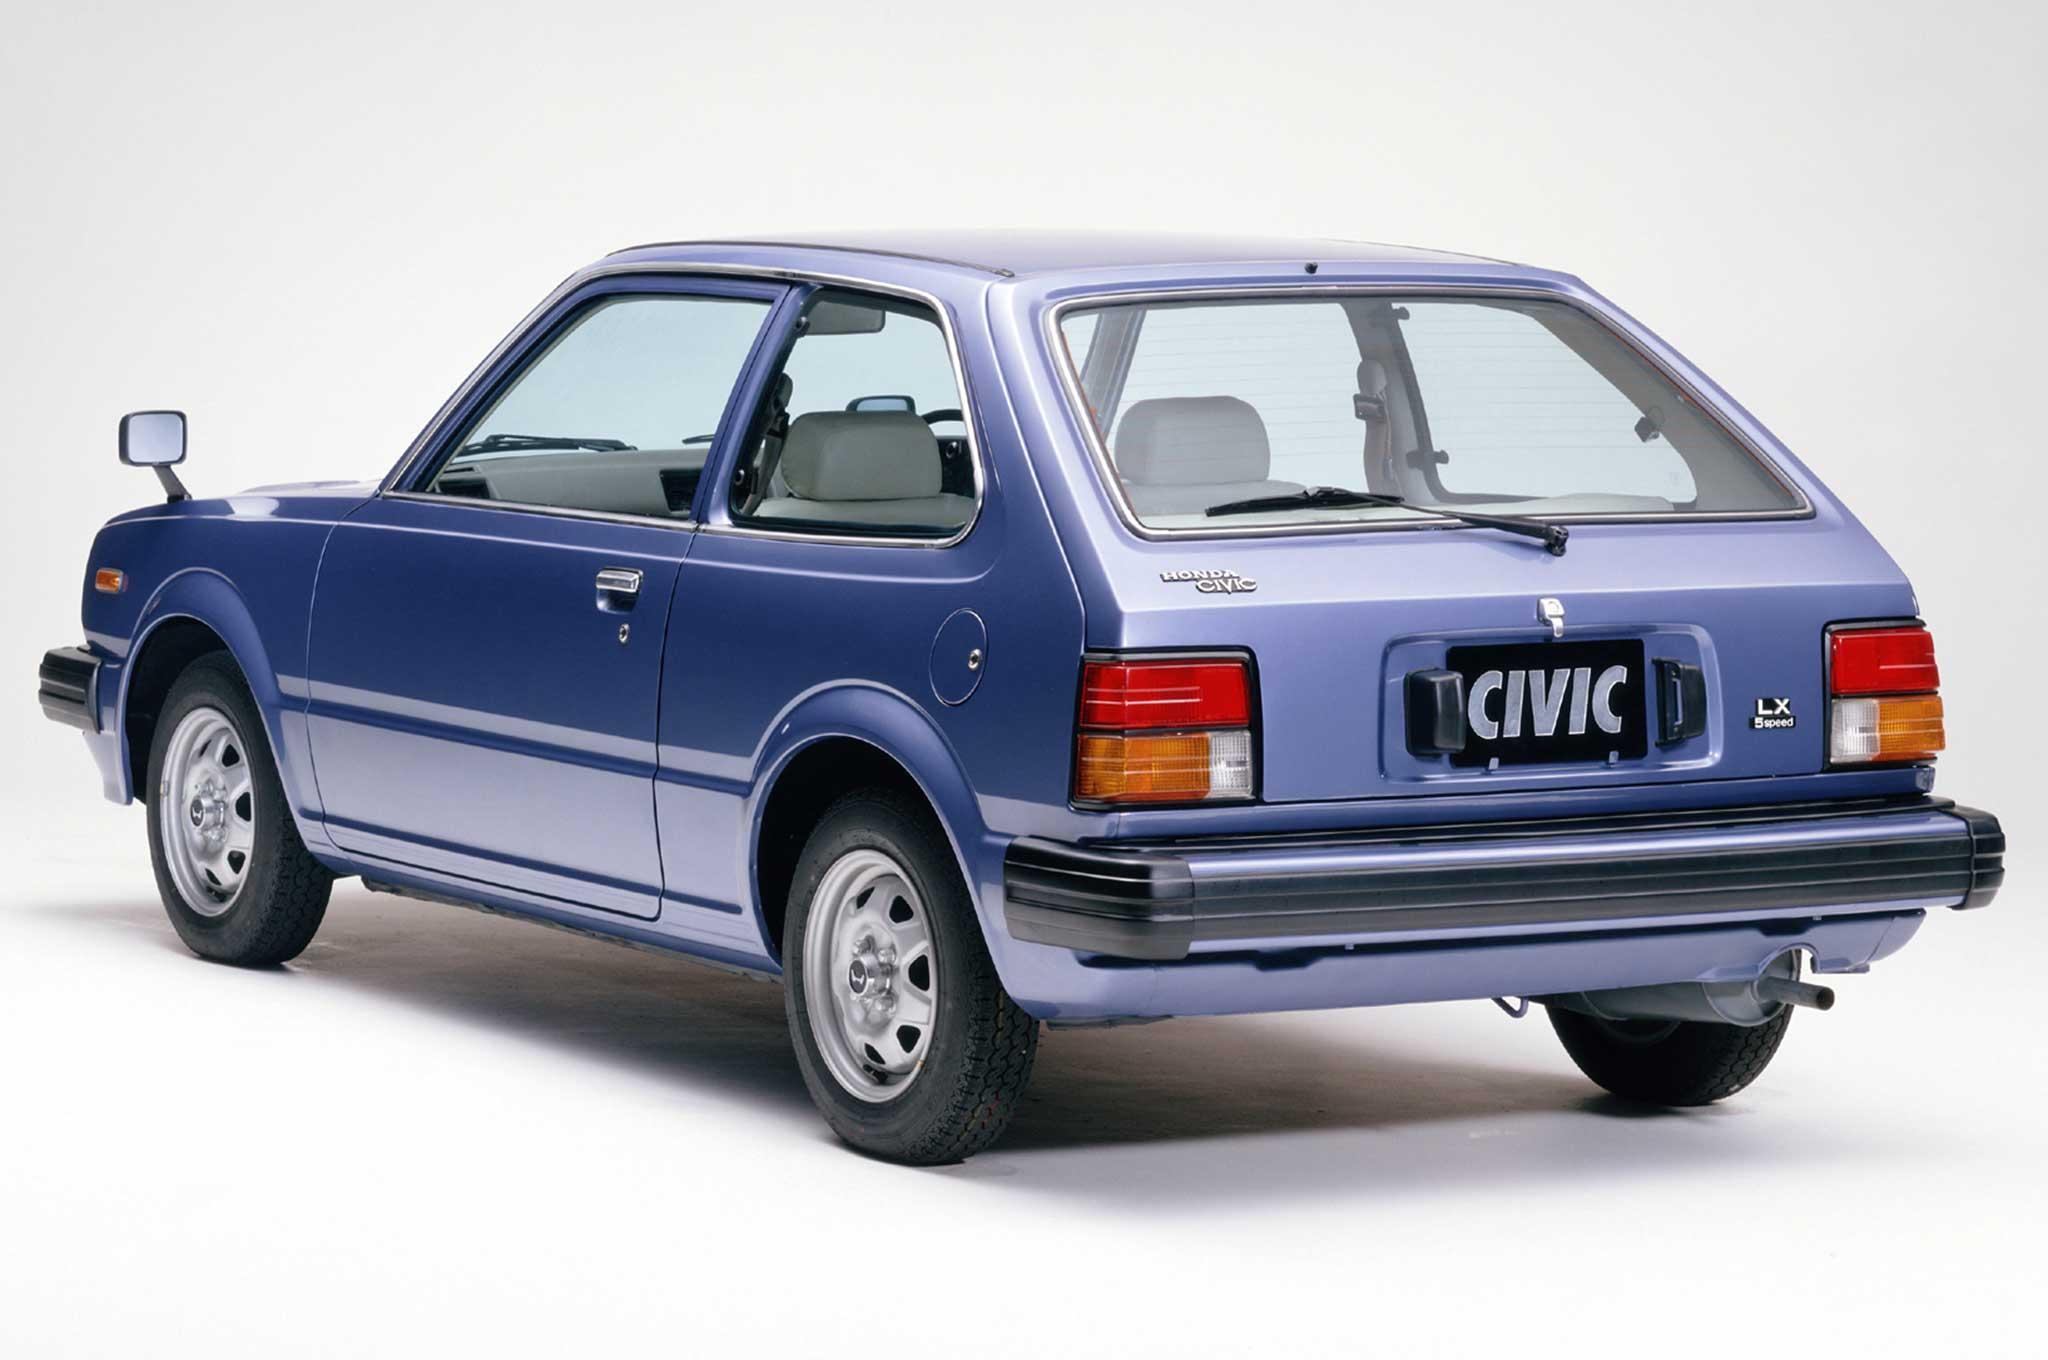 Honda Civic Generations >> Honda Civic History 10 Generations